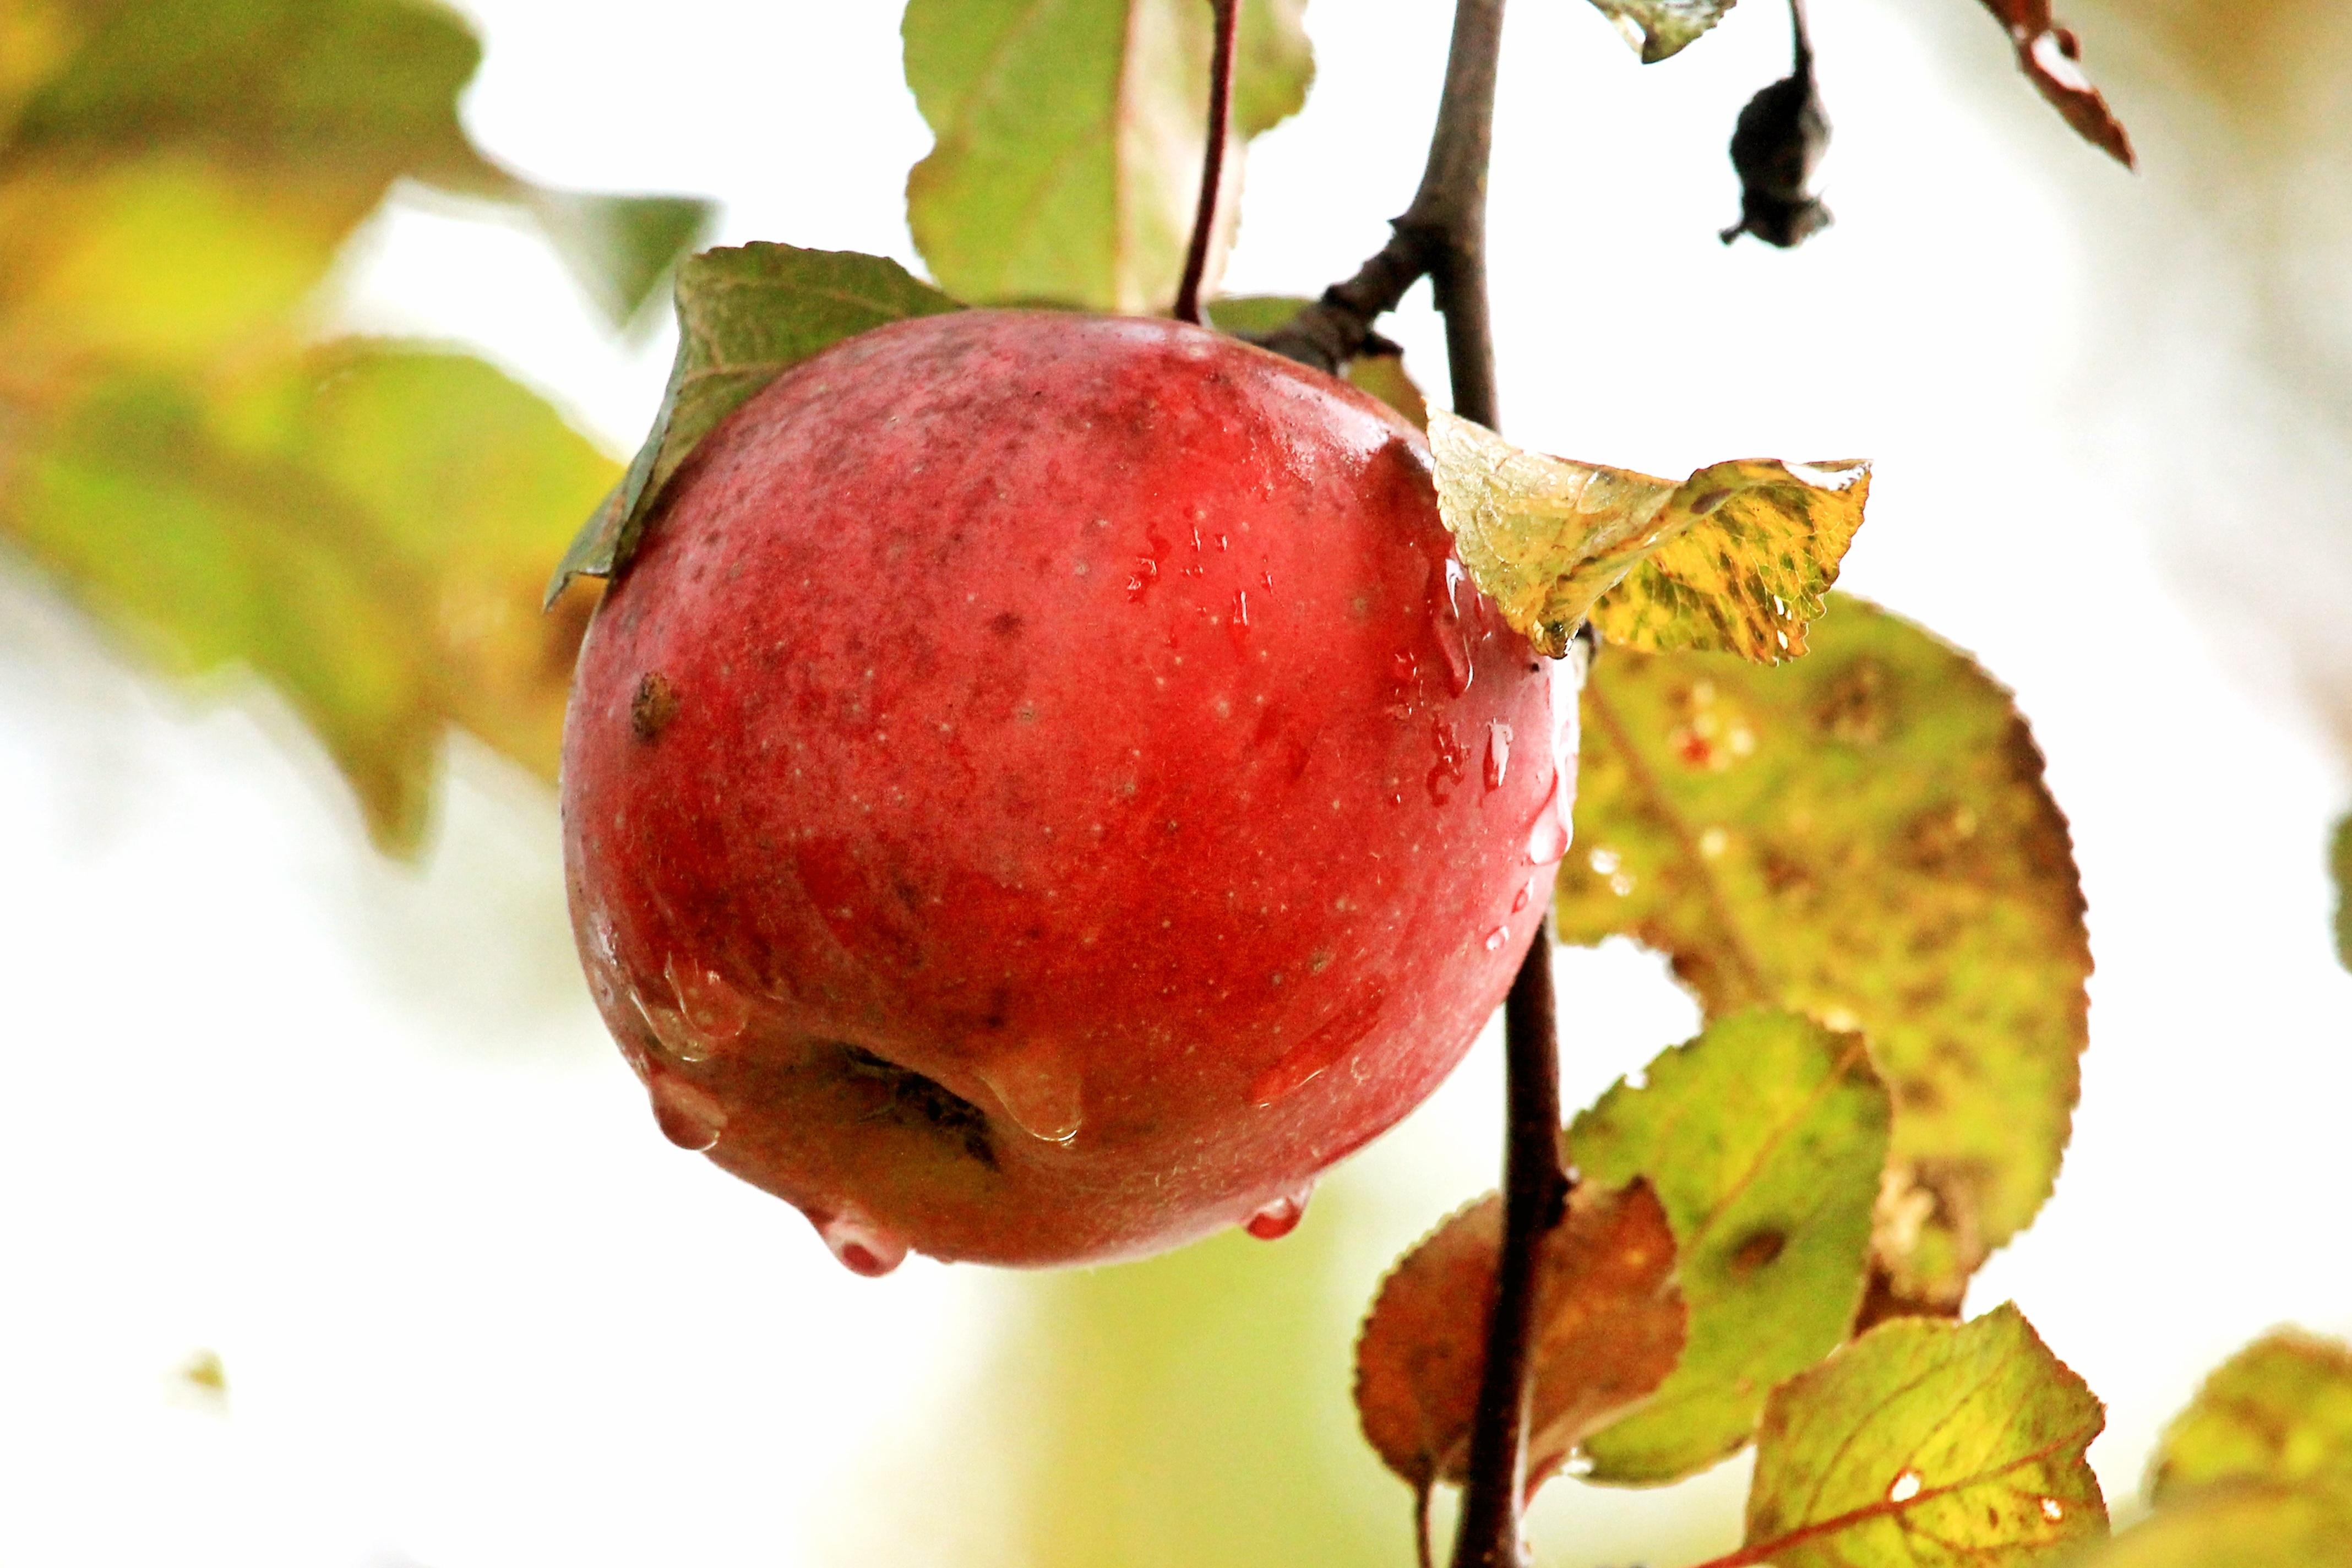 фото яблоки с каплями дождя предлагает шаблоны